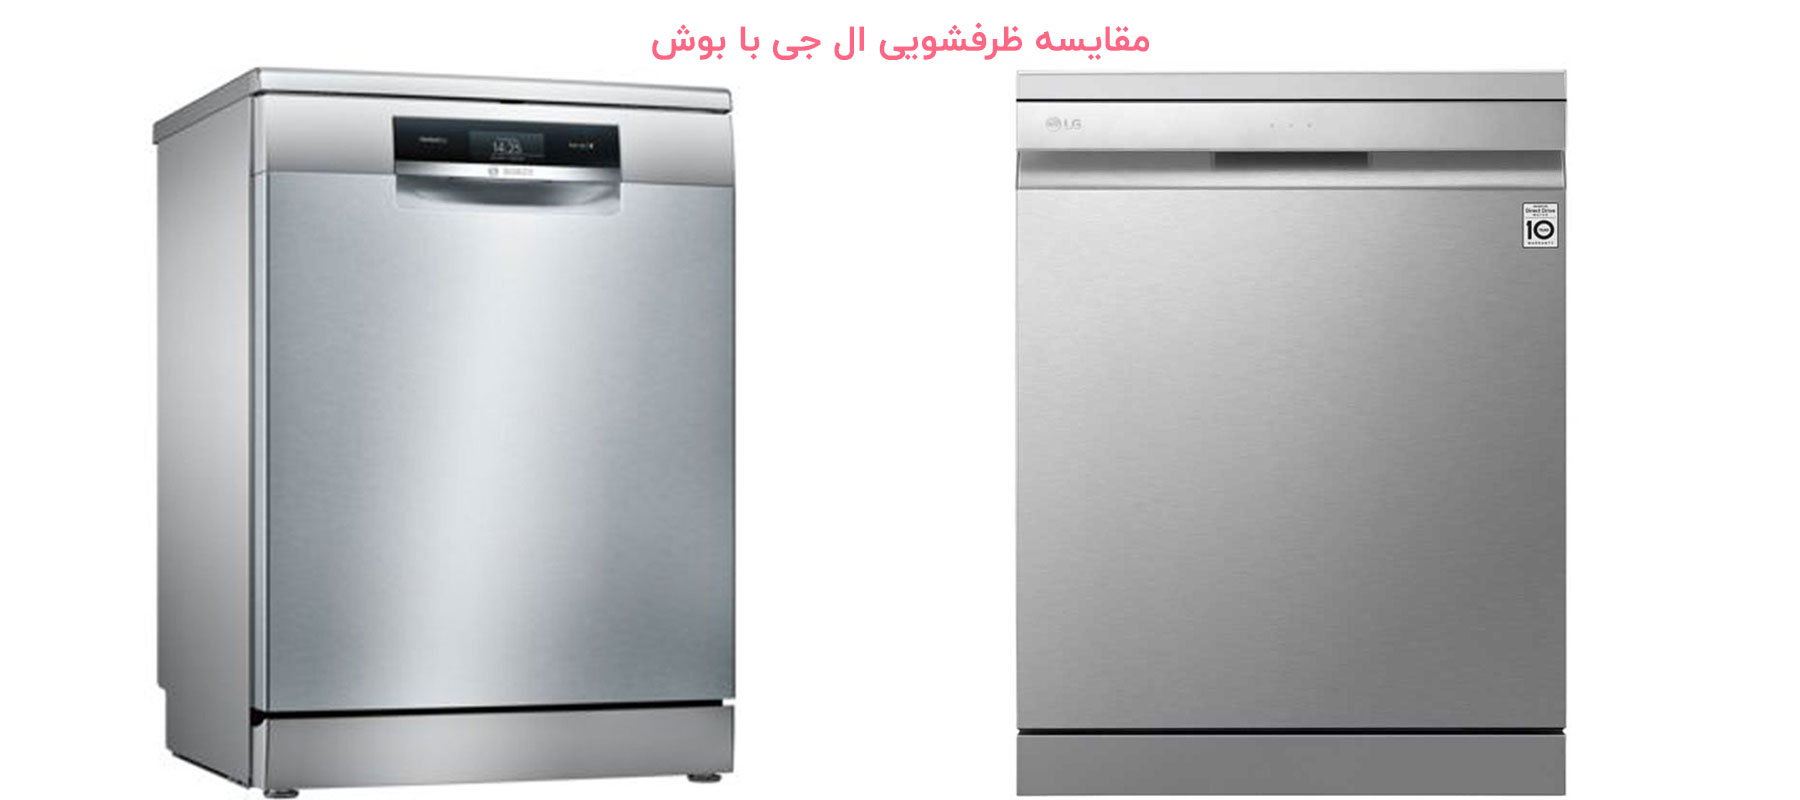 مقایسه ظرفشویی ال جی با بوش